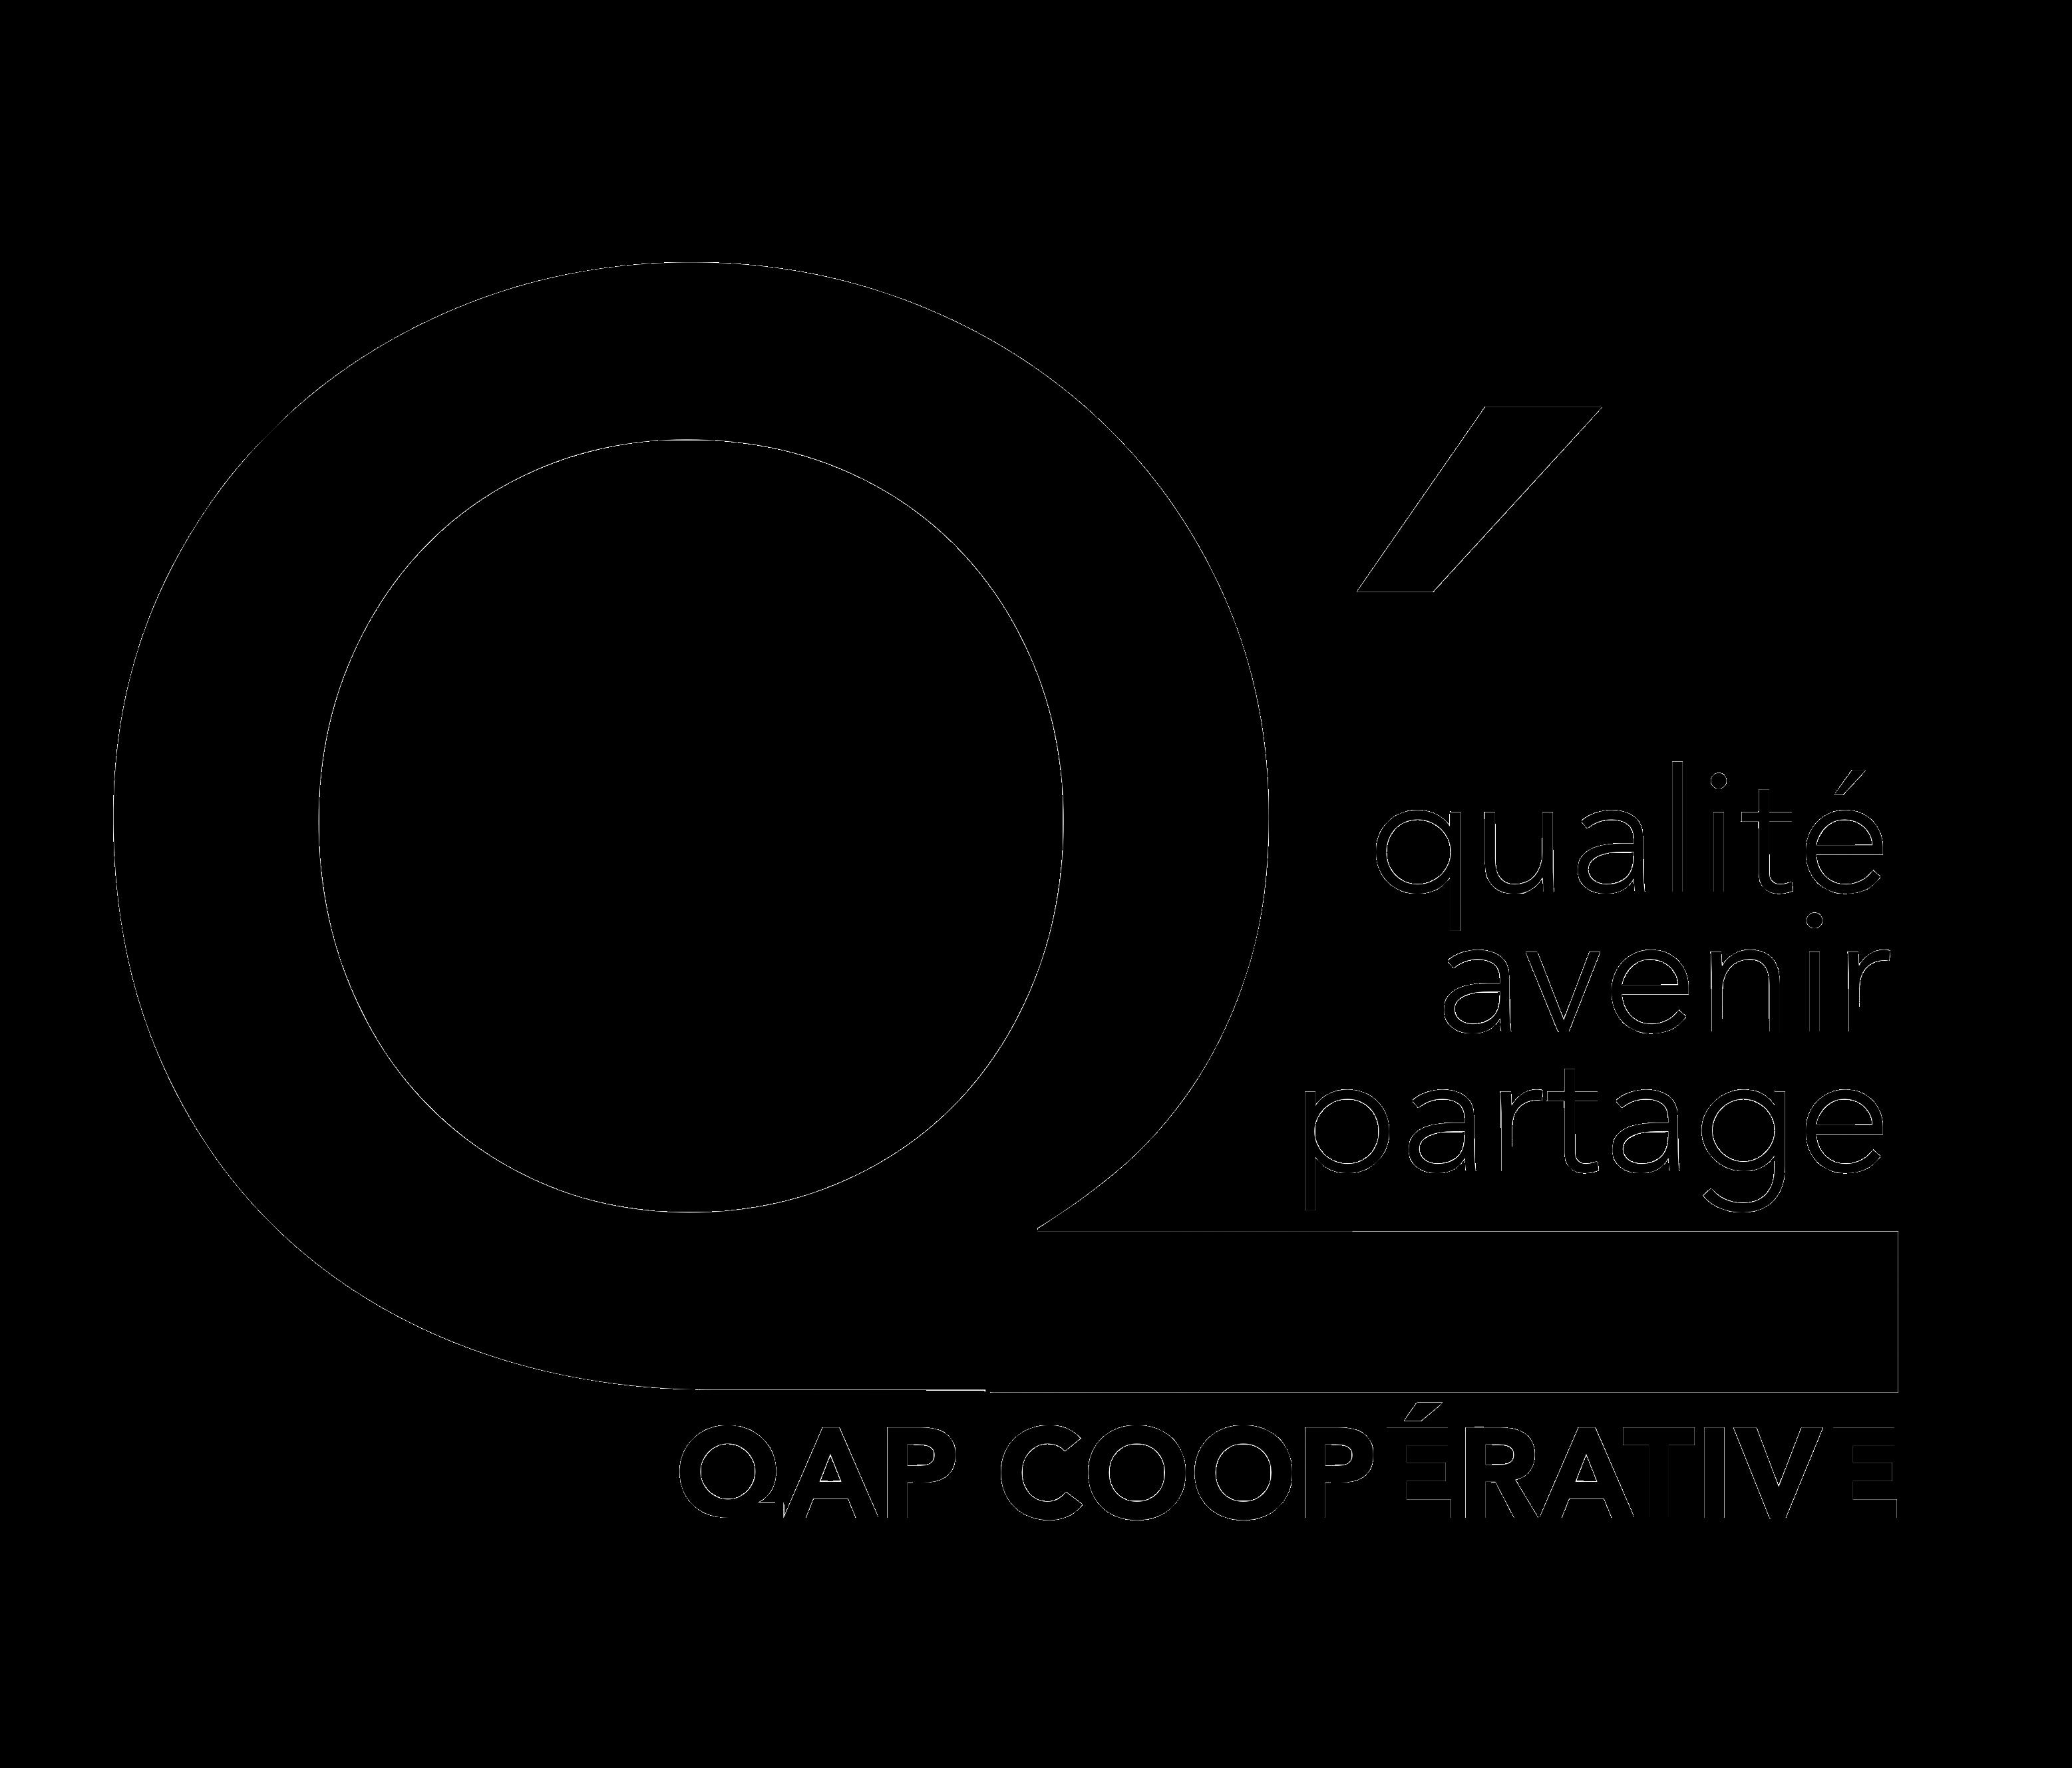 QAP Coopérative & Comptoir d'Artisans